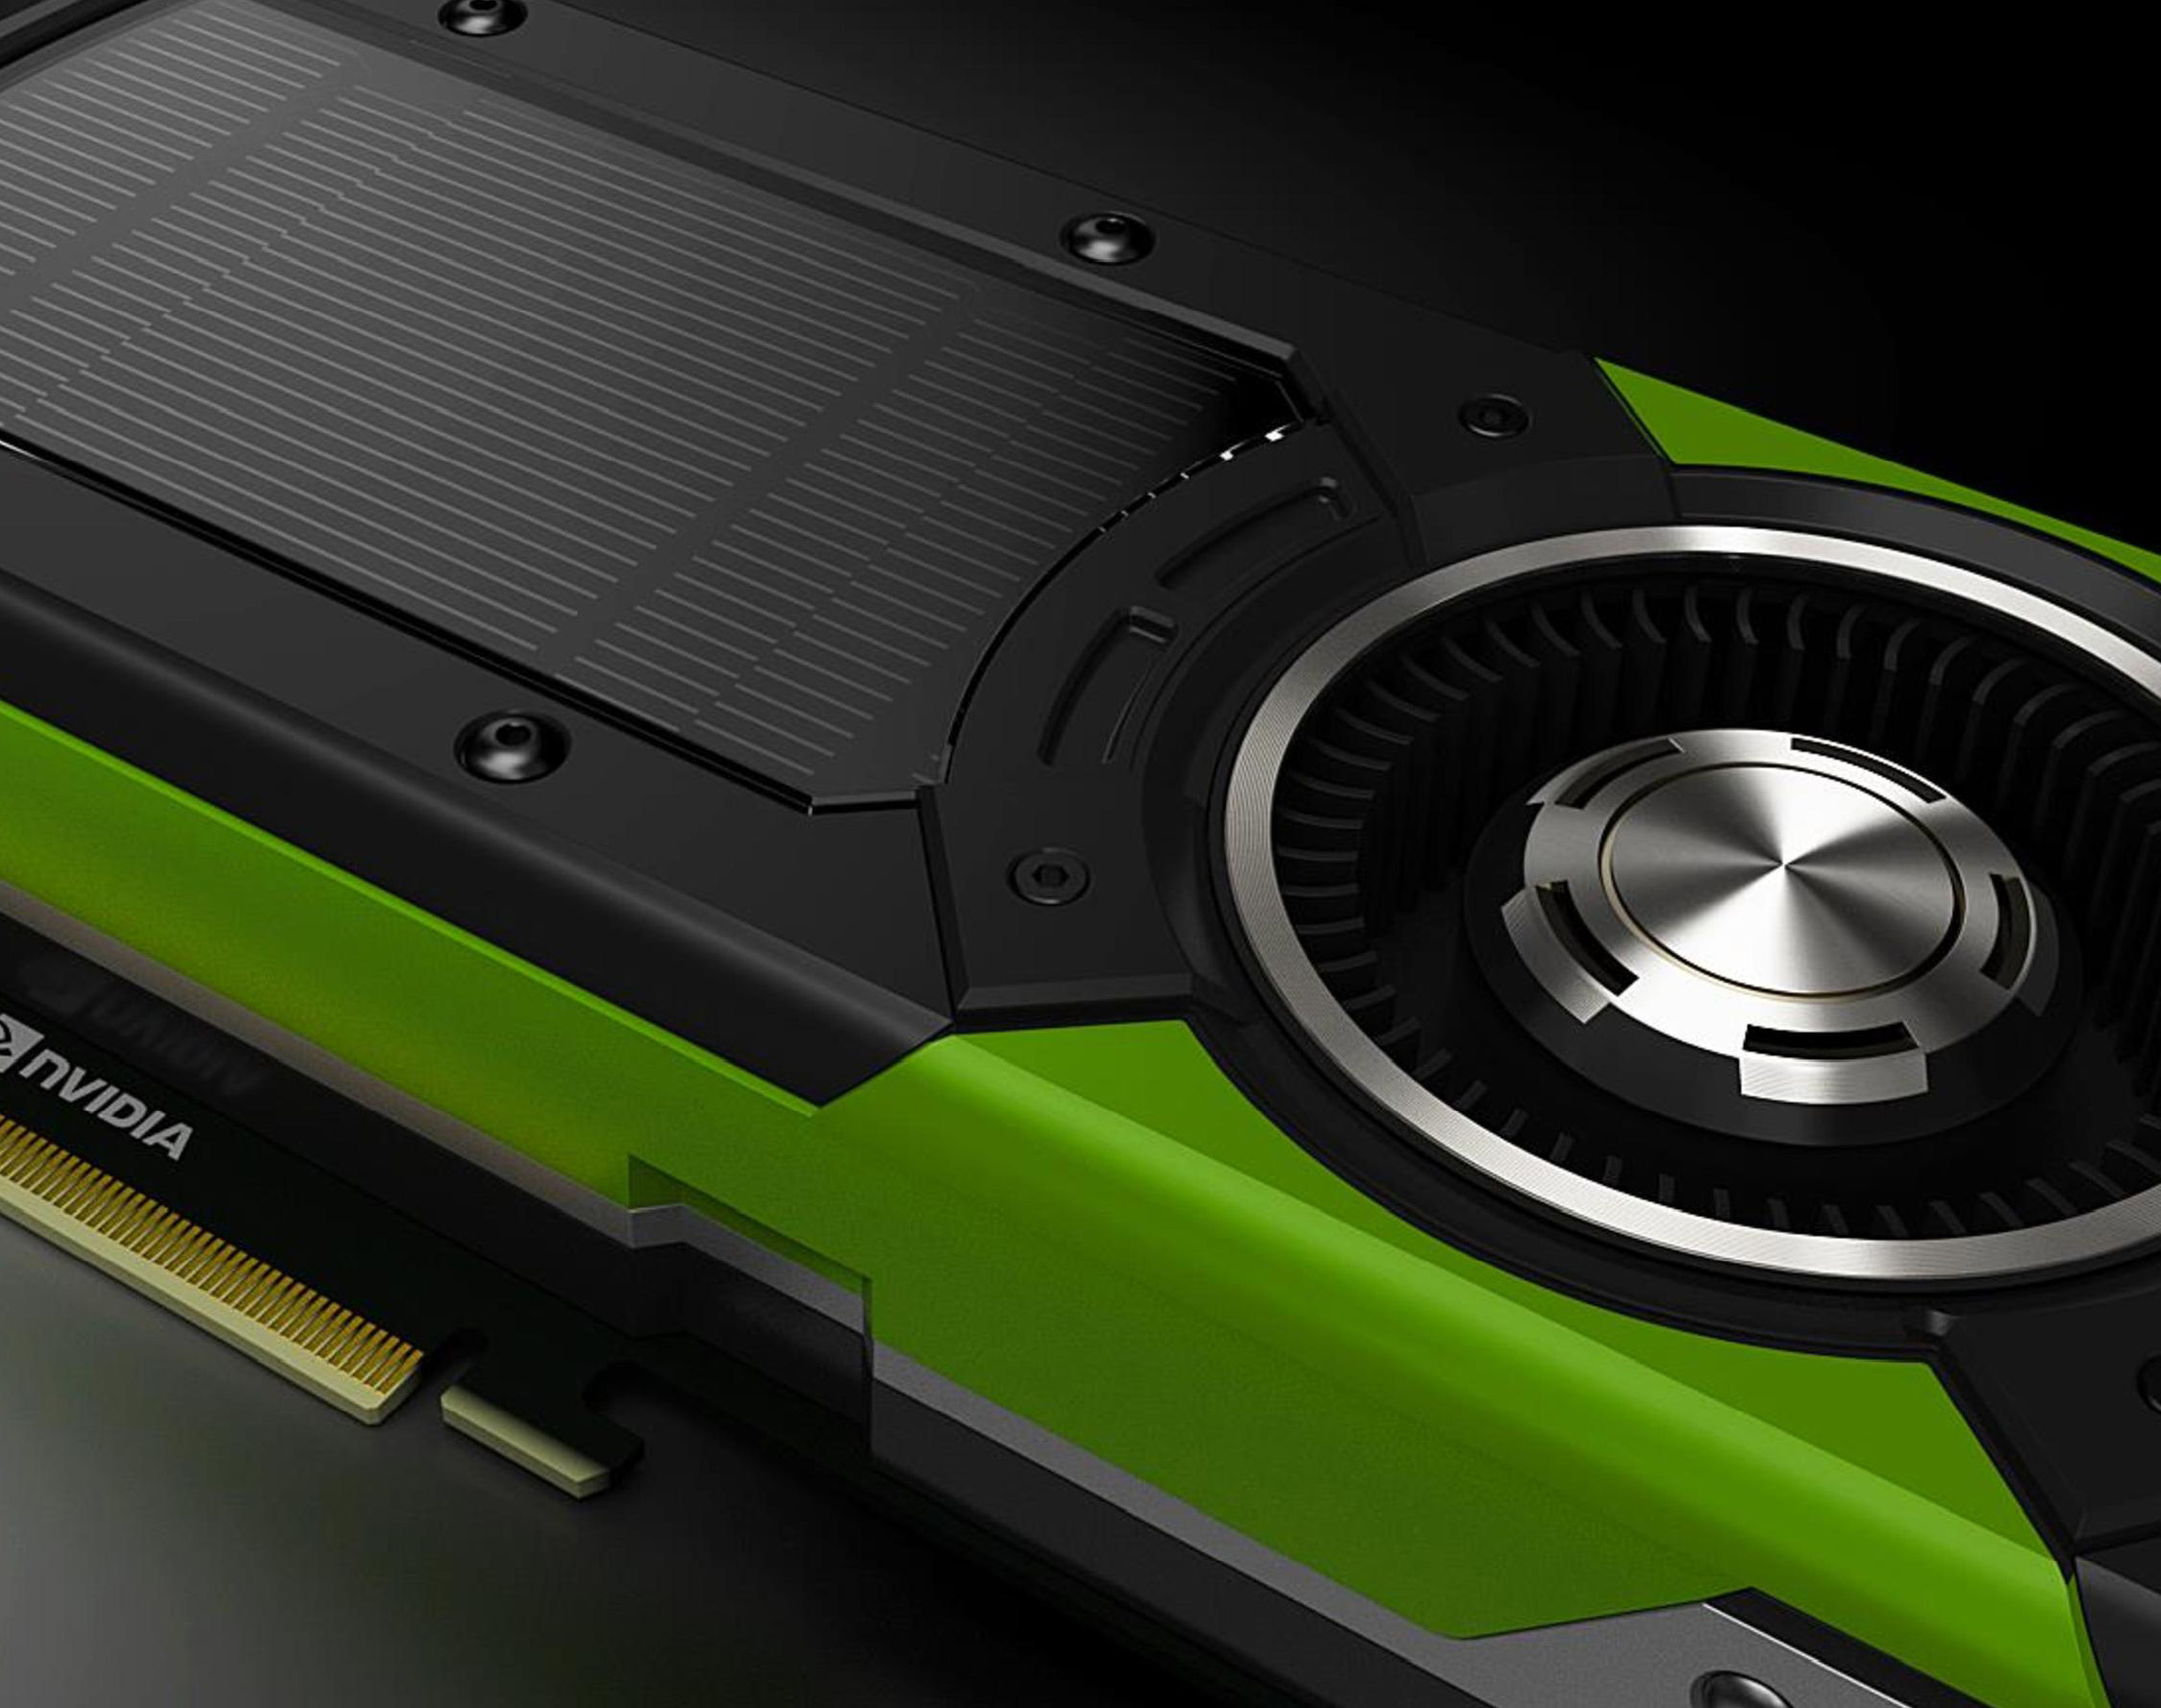 Photo of אופס: ב-NVIDIA חושפים שה-GeForce GTX 1080 Ti כבר בדרך